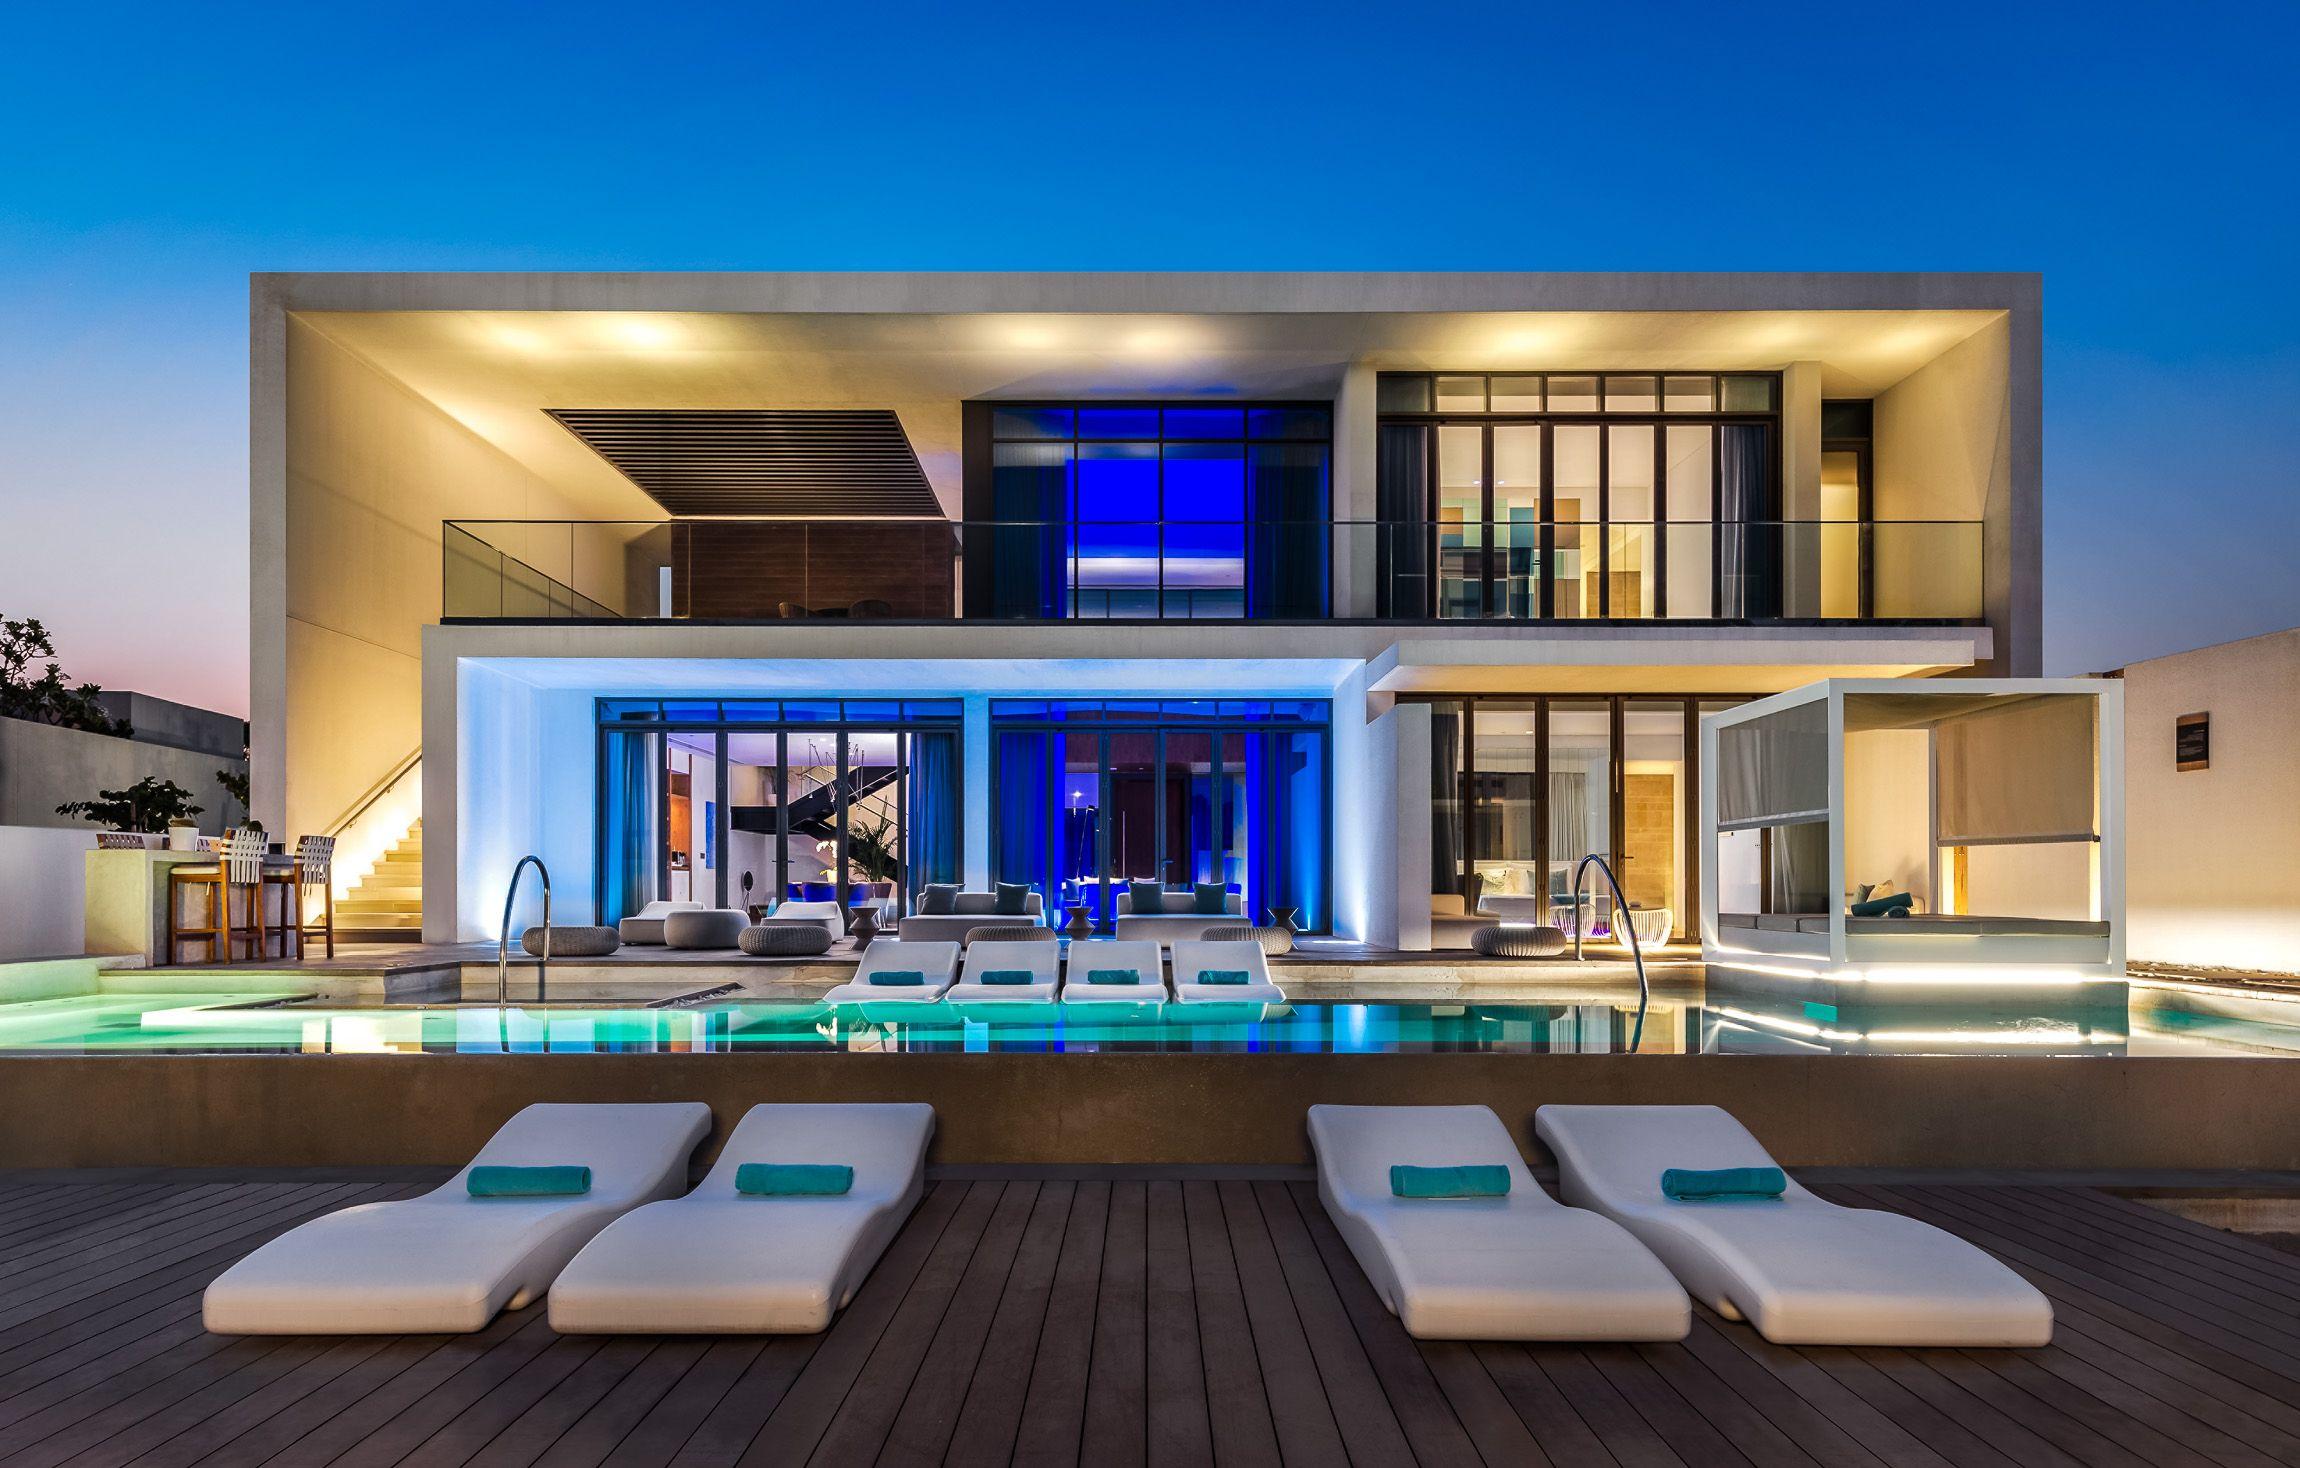 Ultimate Villa Luxury Retreats Luxury Villa Rentals Luxury Retreats House Plans For Sale